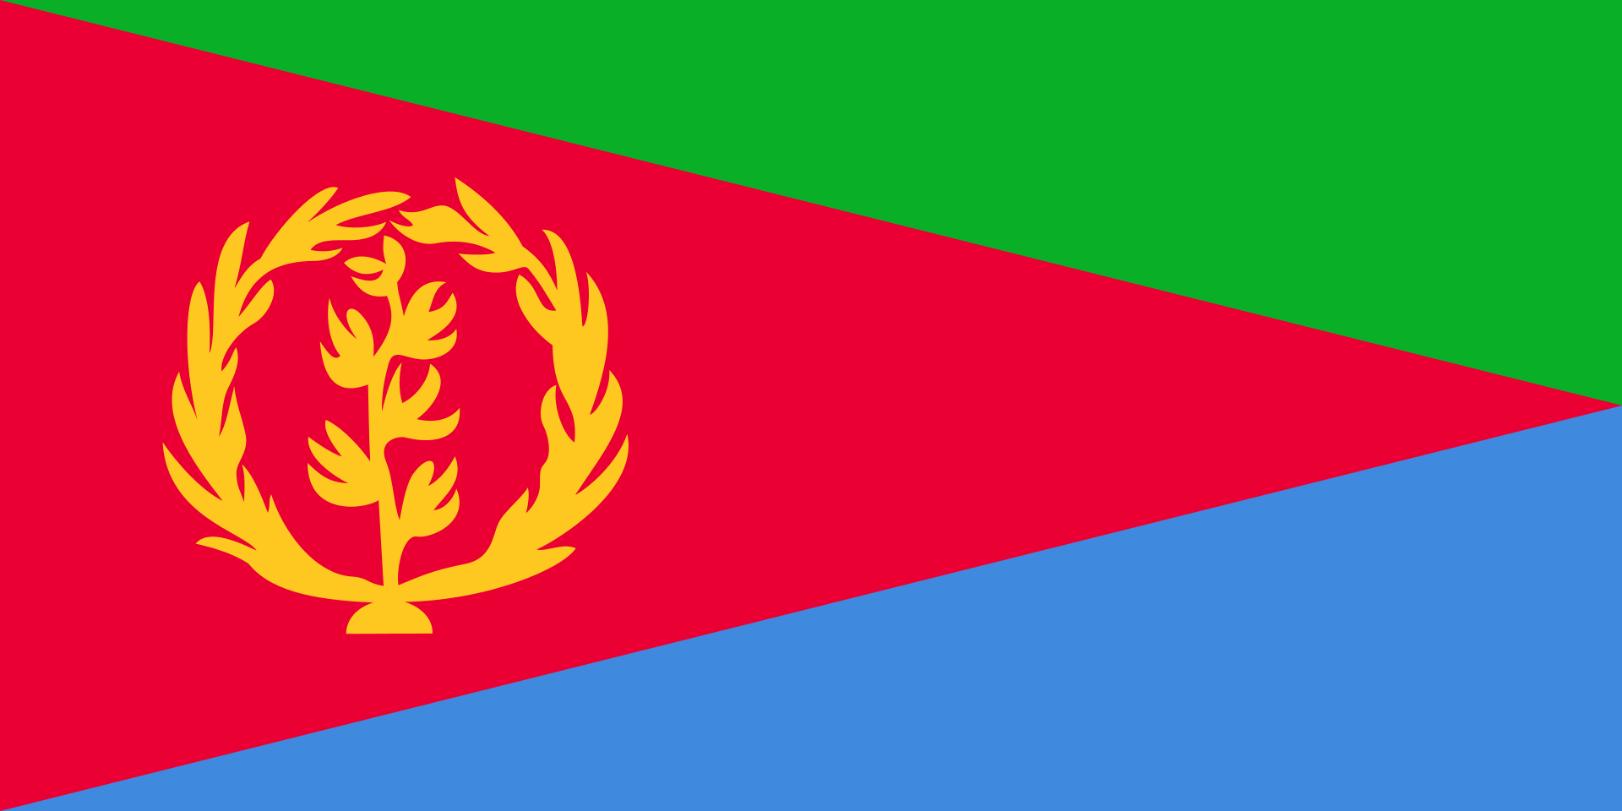 Flagge im Querformat Land Eritrea150x100 cm